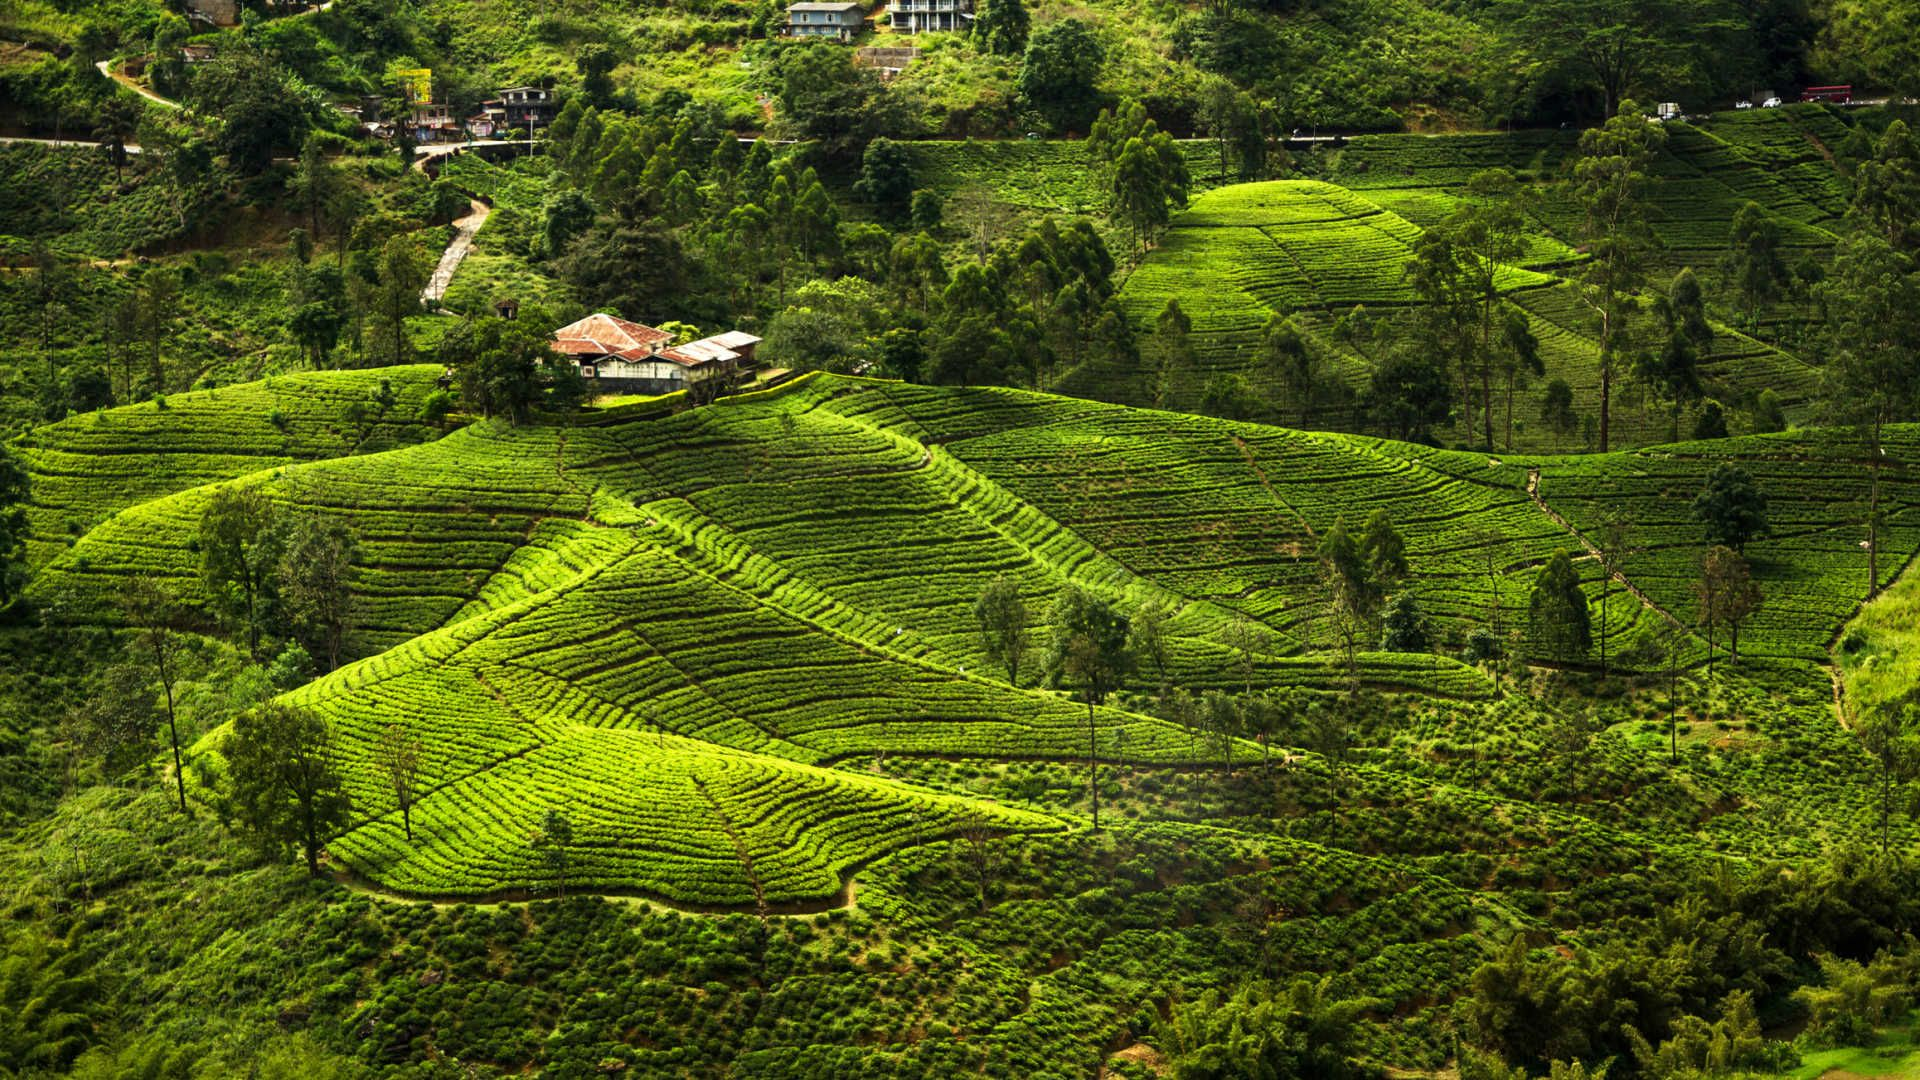 Nuwara Eliya Is A City In The Tea Country Hills Of Central Sri Lanka The Naturally Landscaped Hakgala Botanical Garden Sri Lanka Travel Usa Buddhist Countries